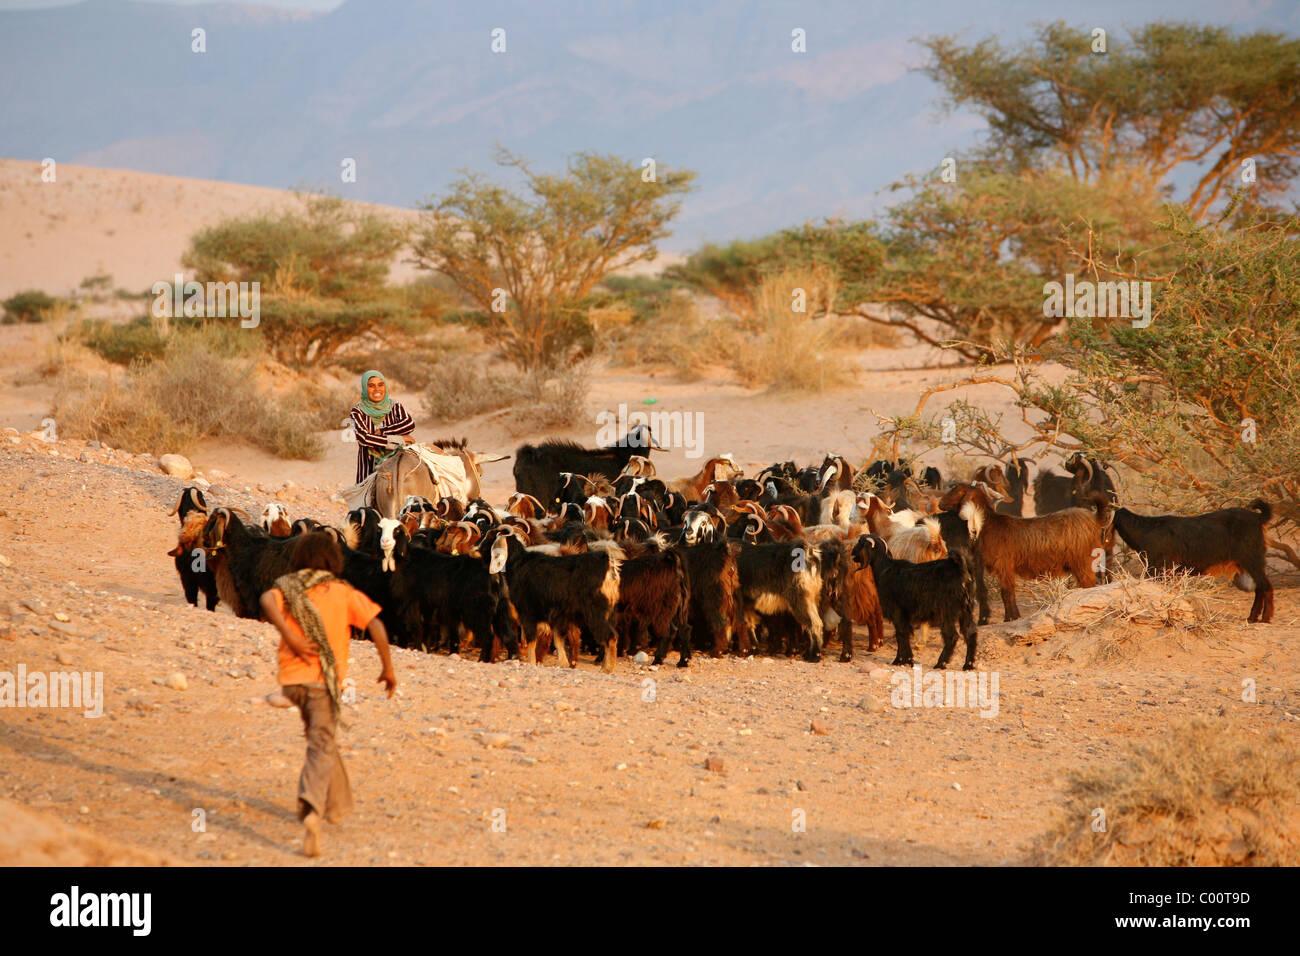 Shepherd and goats at Wadi Araba, Jordan. - Stock Image